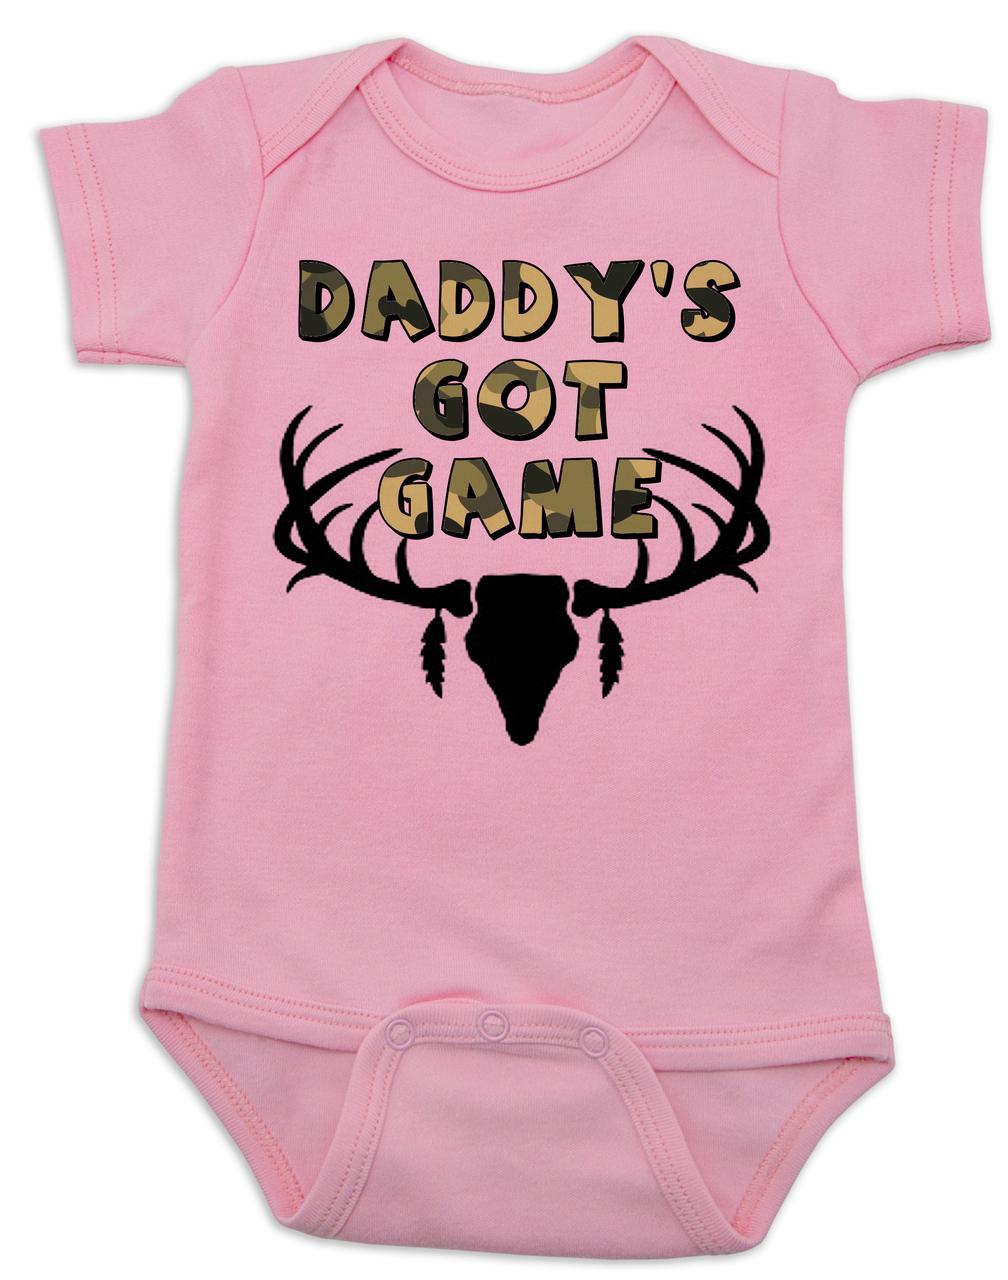 1st Fathers Day Onesie\u00ae Funny Baby Onesie\u00ae Cute Baby Onesie\u00ae Sayings Daddy/'s Little Hunting Buddy Onesie\u00ae Fathers Day Gift from Baby